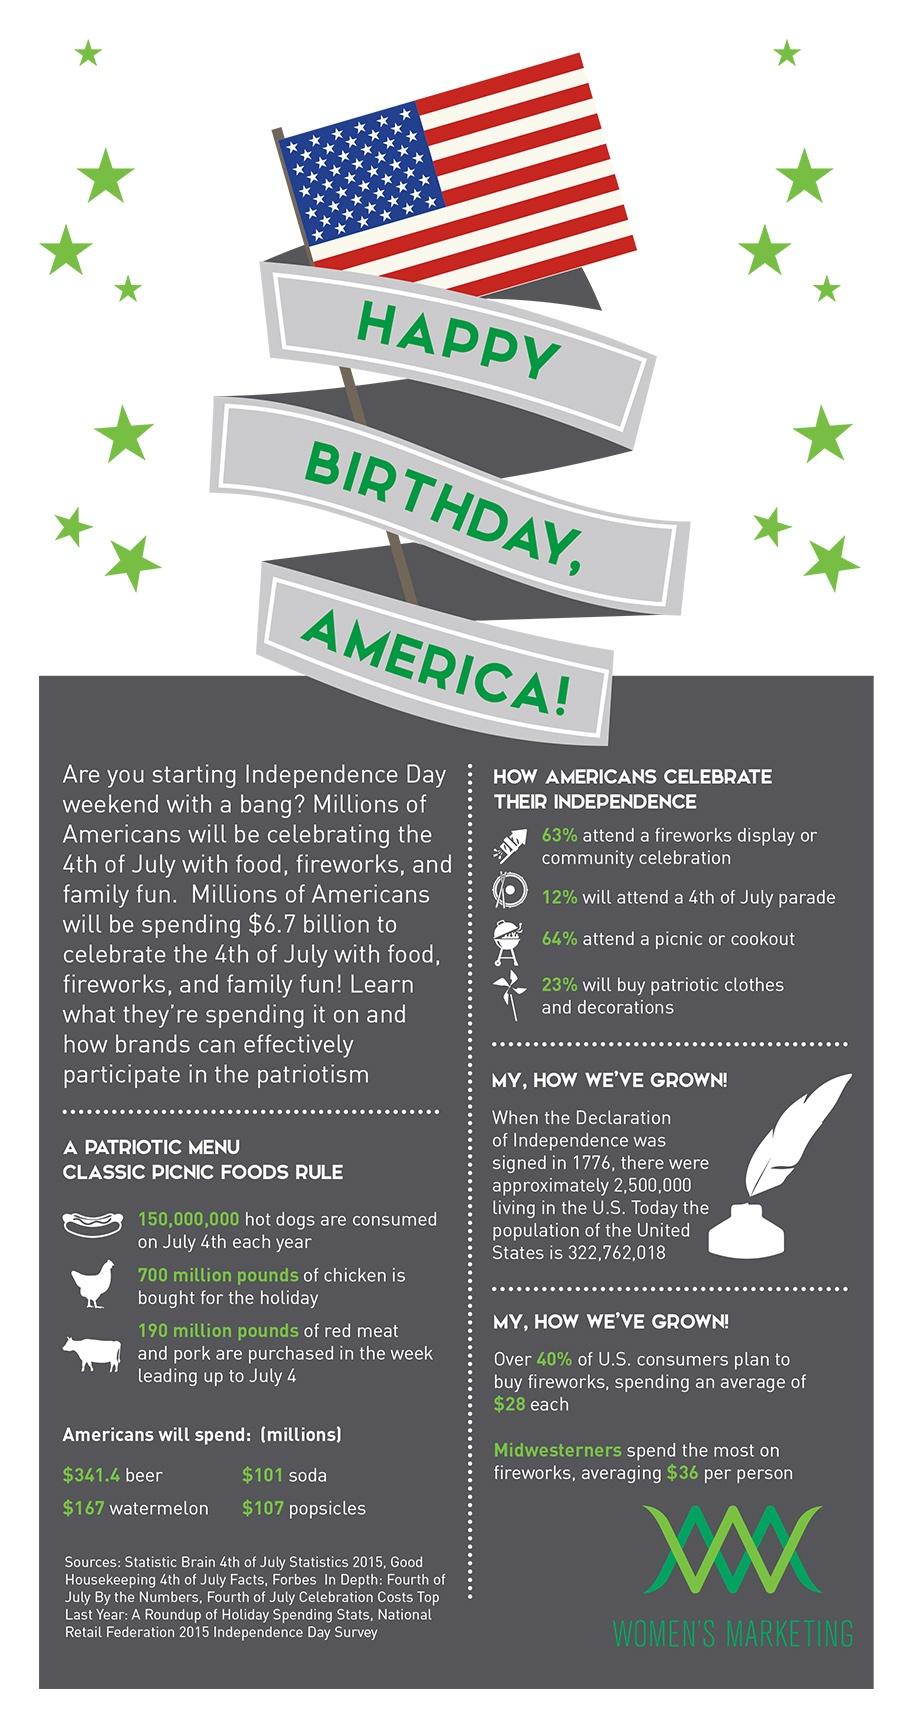 4thofJuly_Infographic.jpg